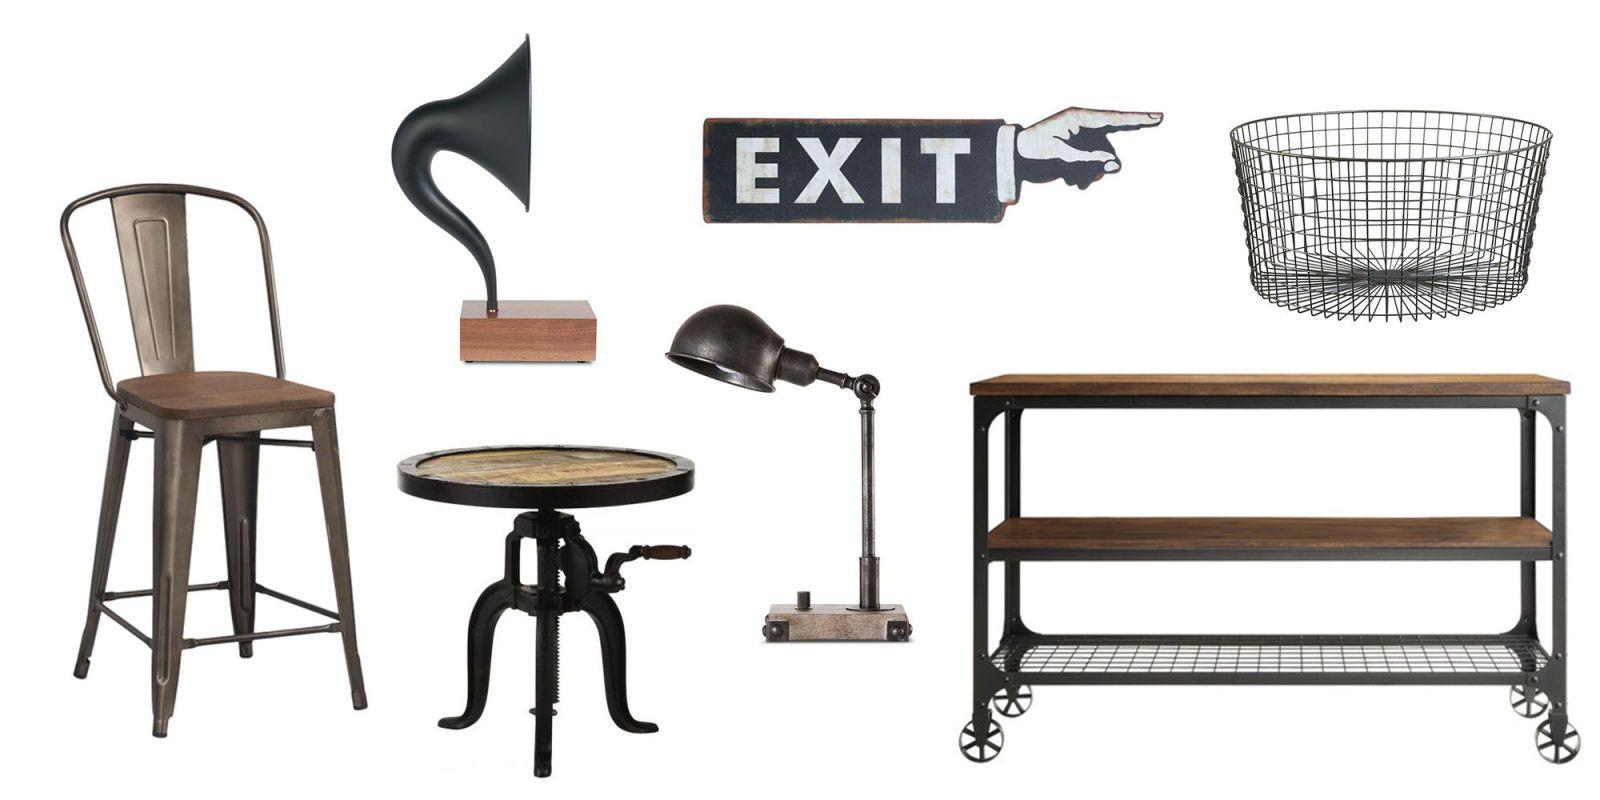 12 Industrial Decor Items That Add an Old-School Edge   Industrial ...